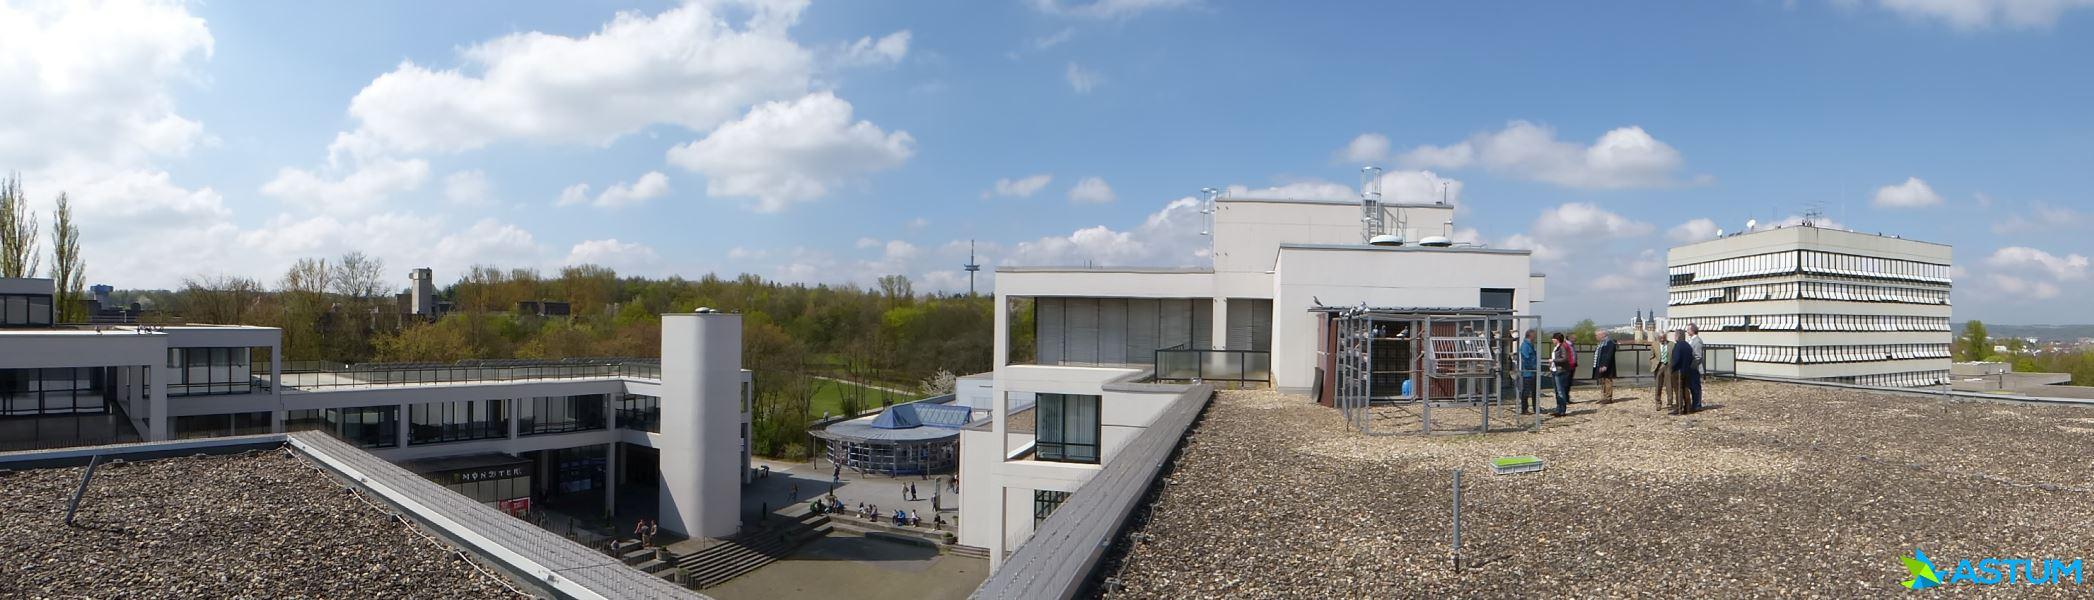 22-UNI-R-Panorama-Dach